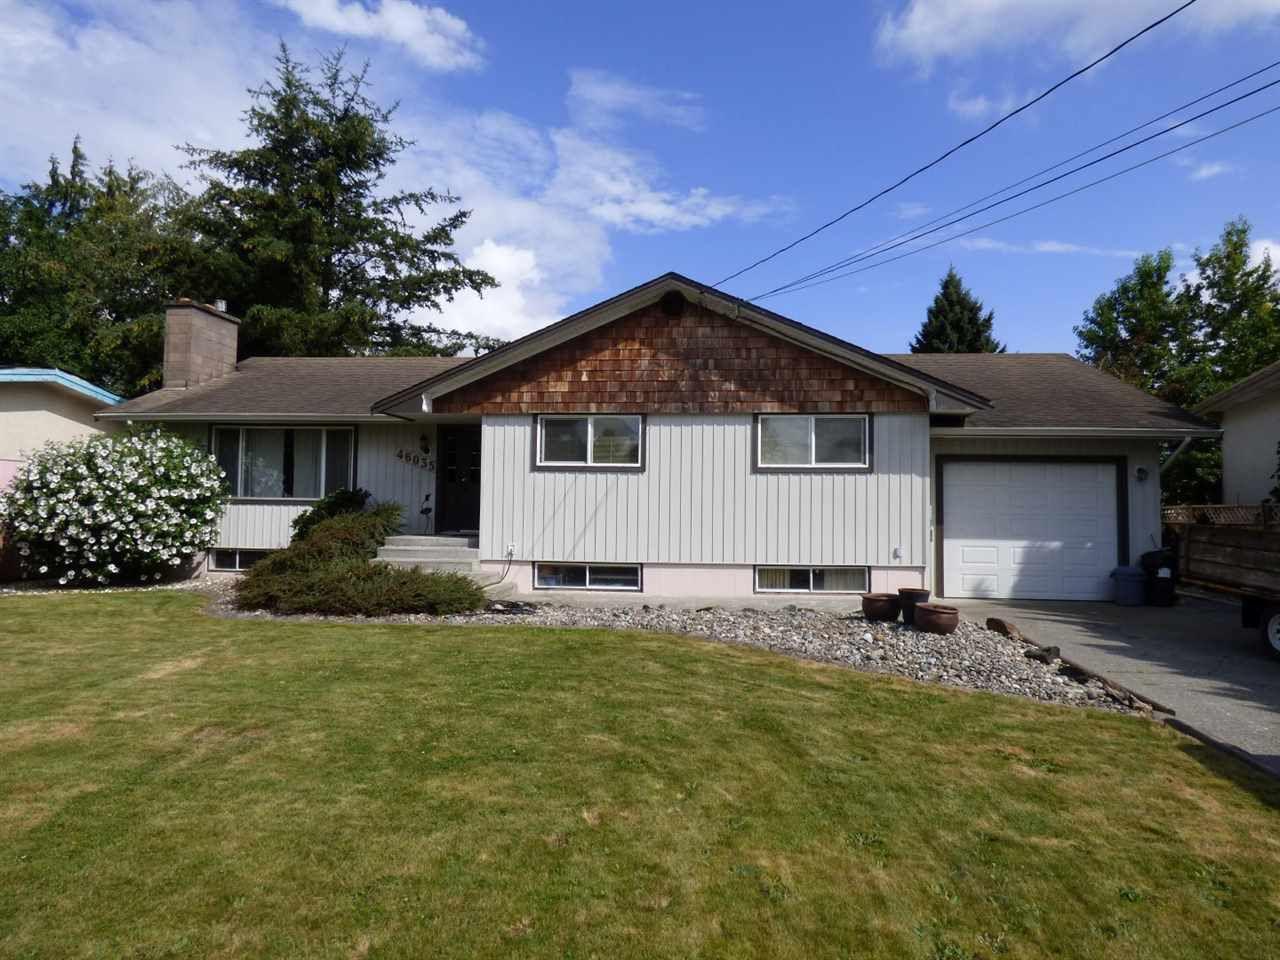 Main Photo: 46035 Avalon Avenue in Chilliwack: Fairfield Island House for sale